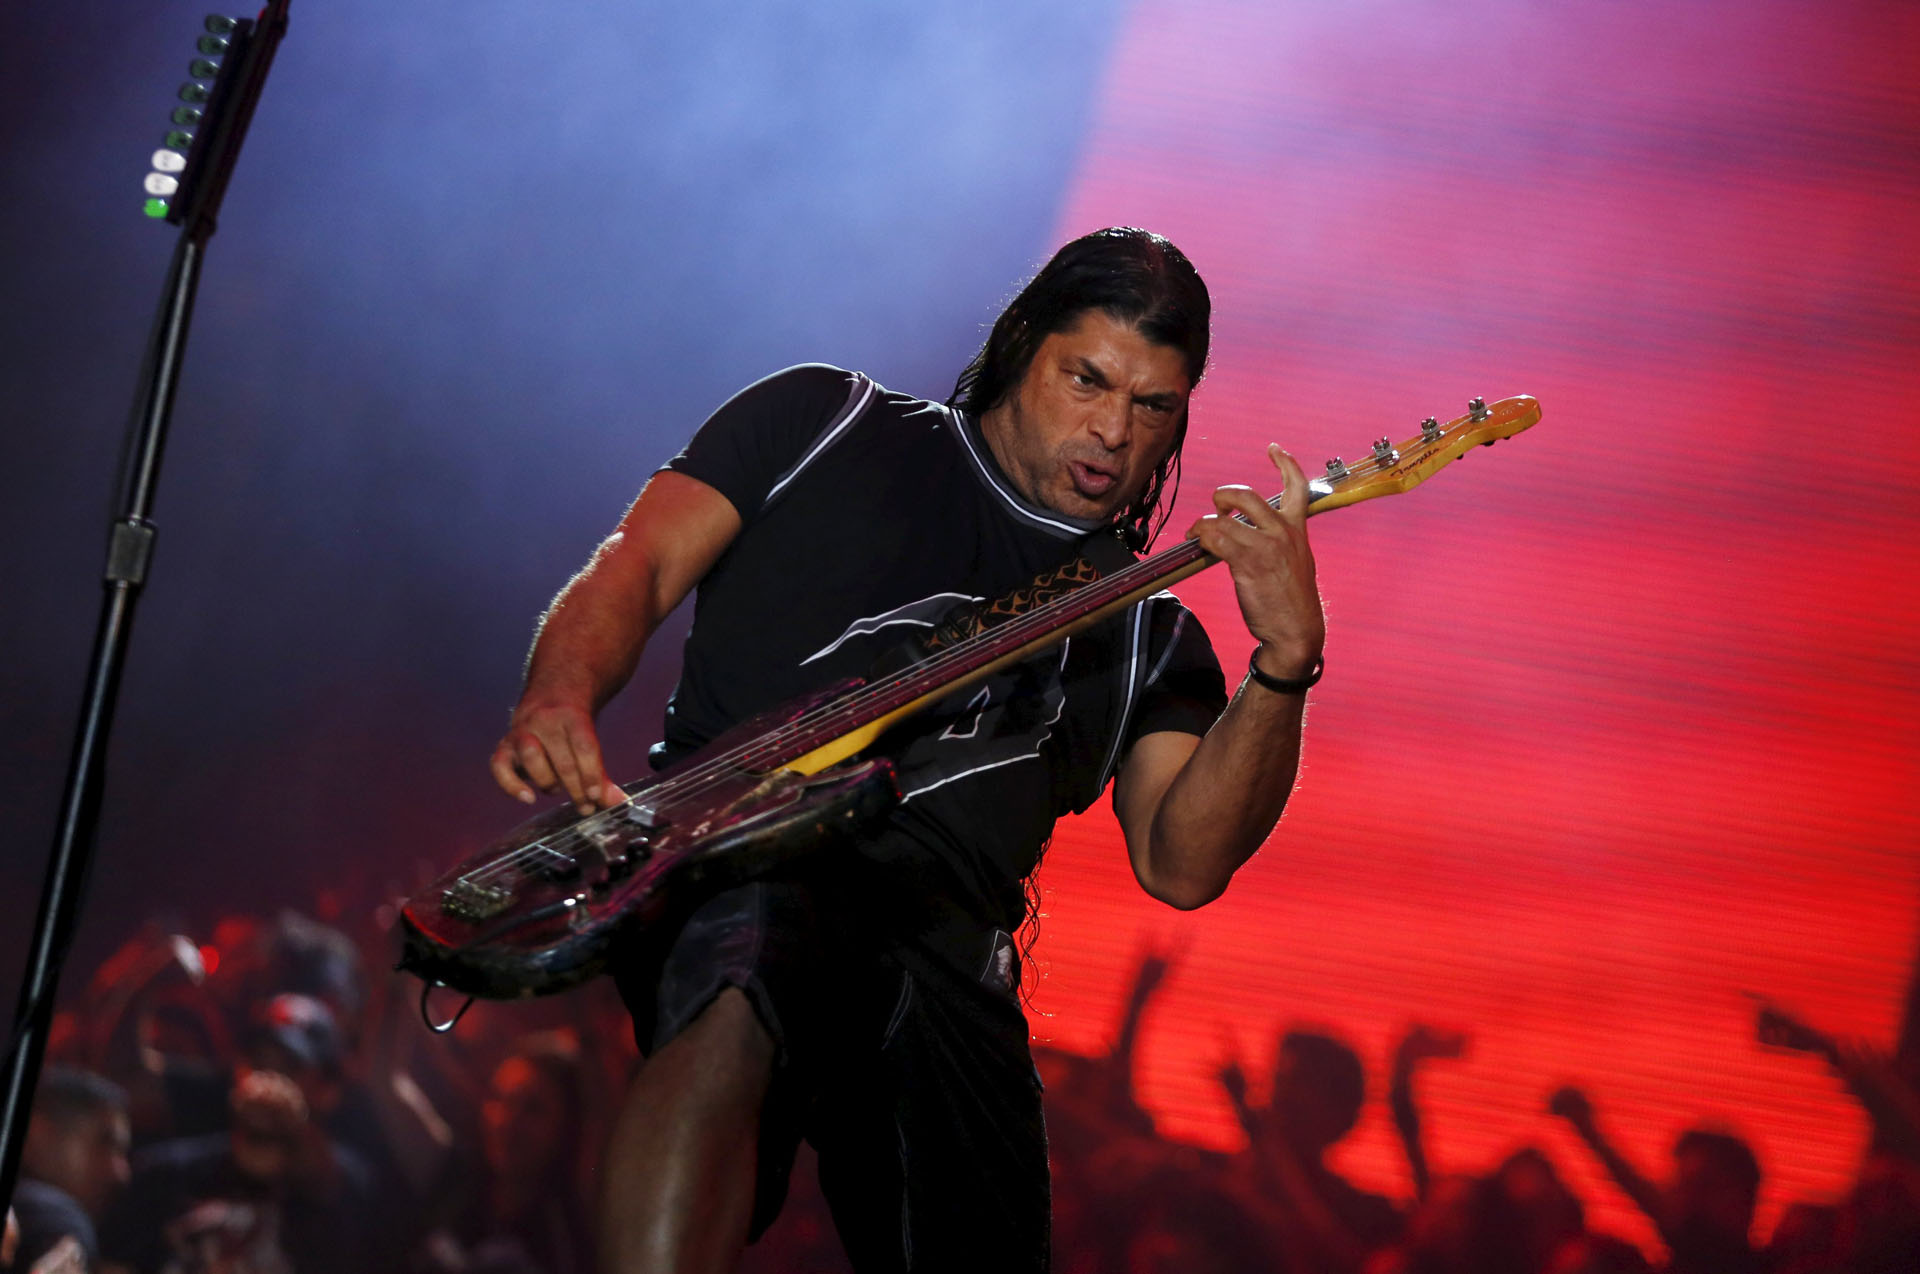 Robert Trujillo of Metallica performs during the Rock in Rio Music Festival in Rio de Janeiro, Brazil, September 20, 2015. REUTERS/Pilar Olivares